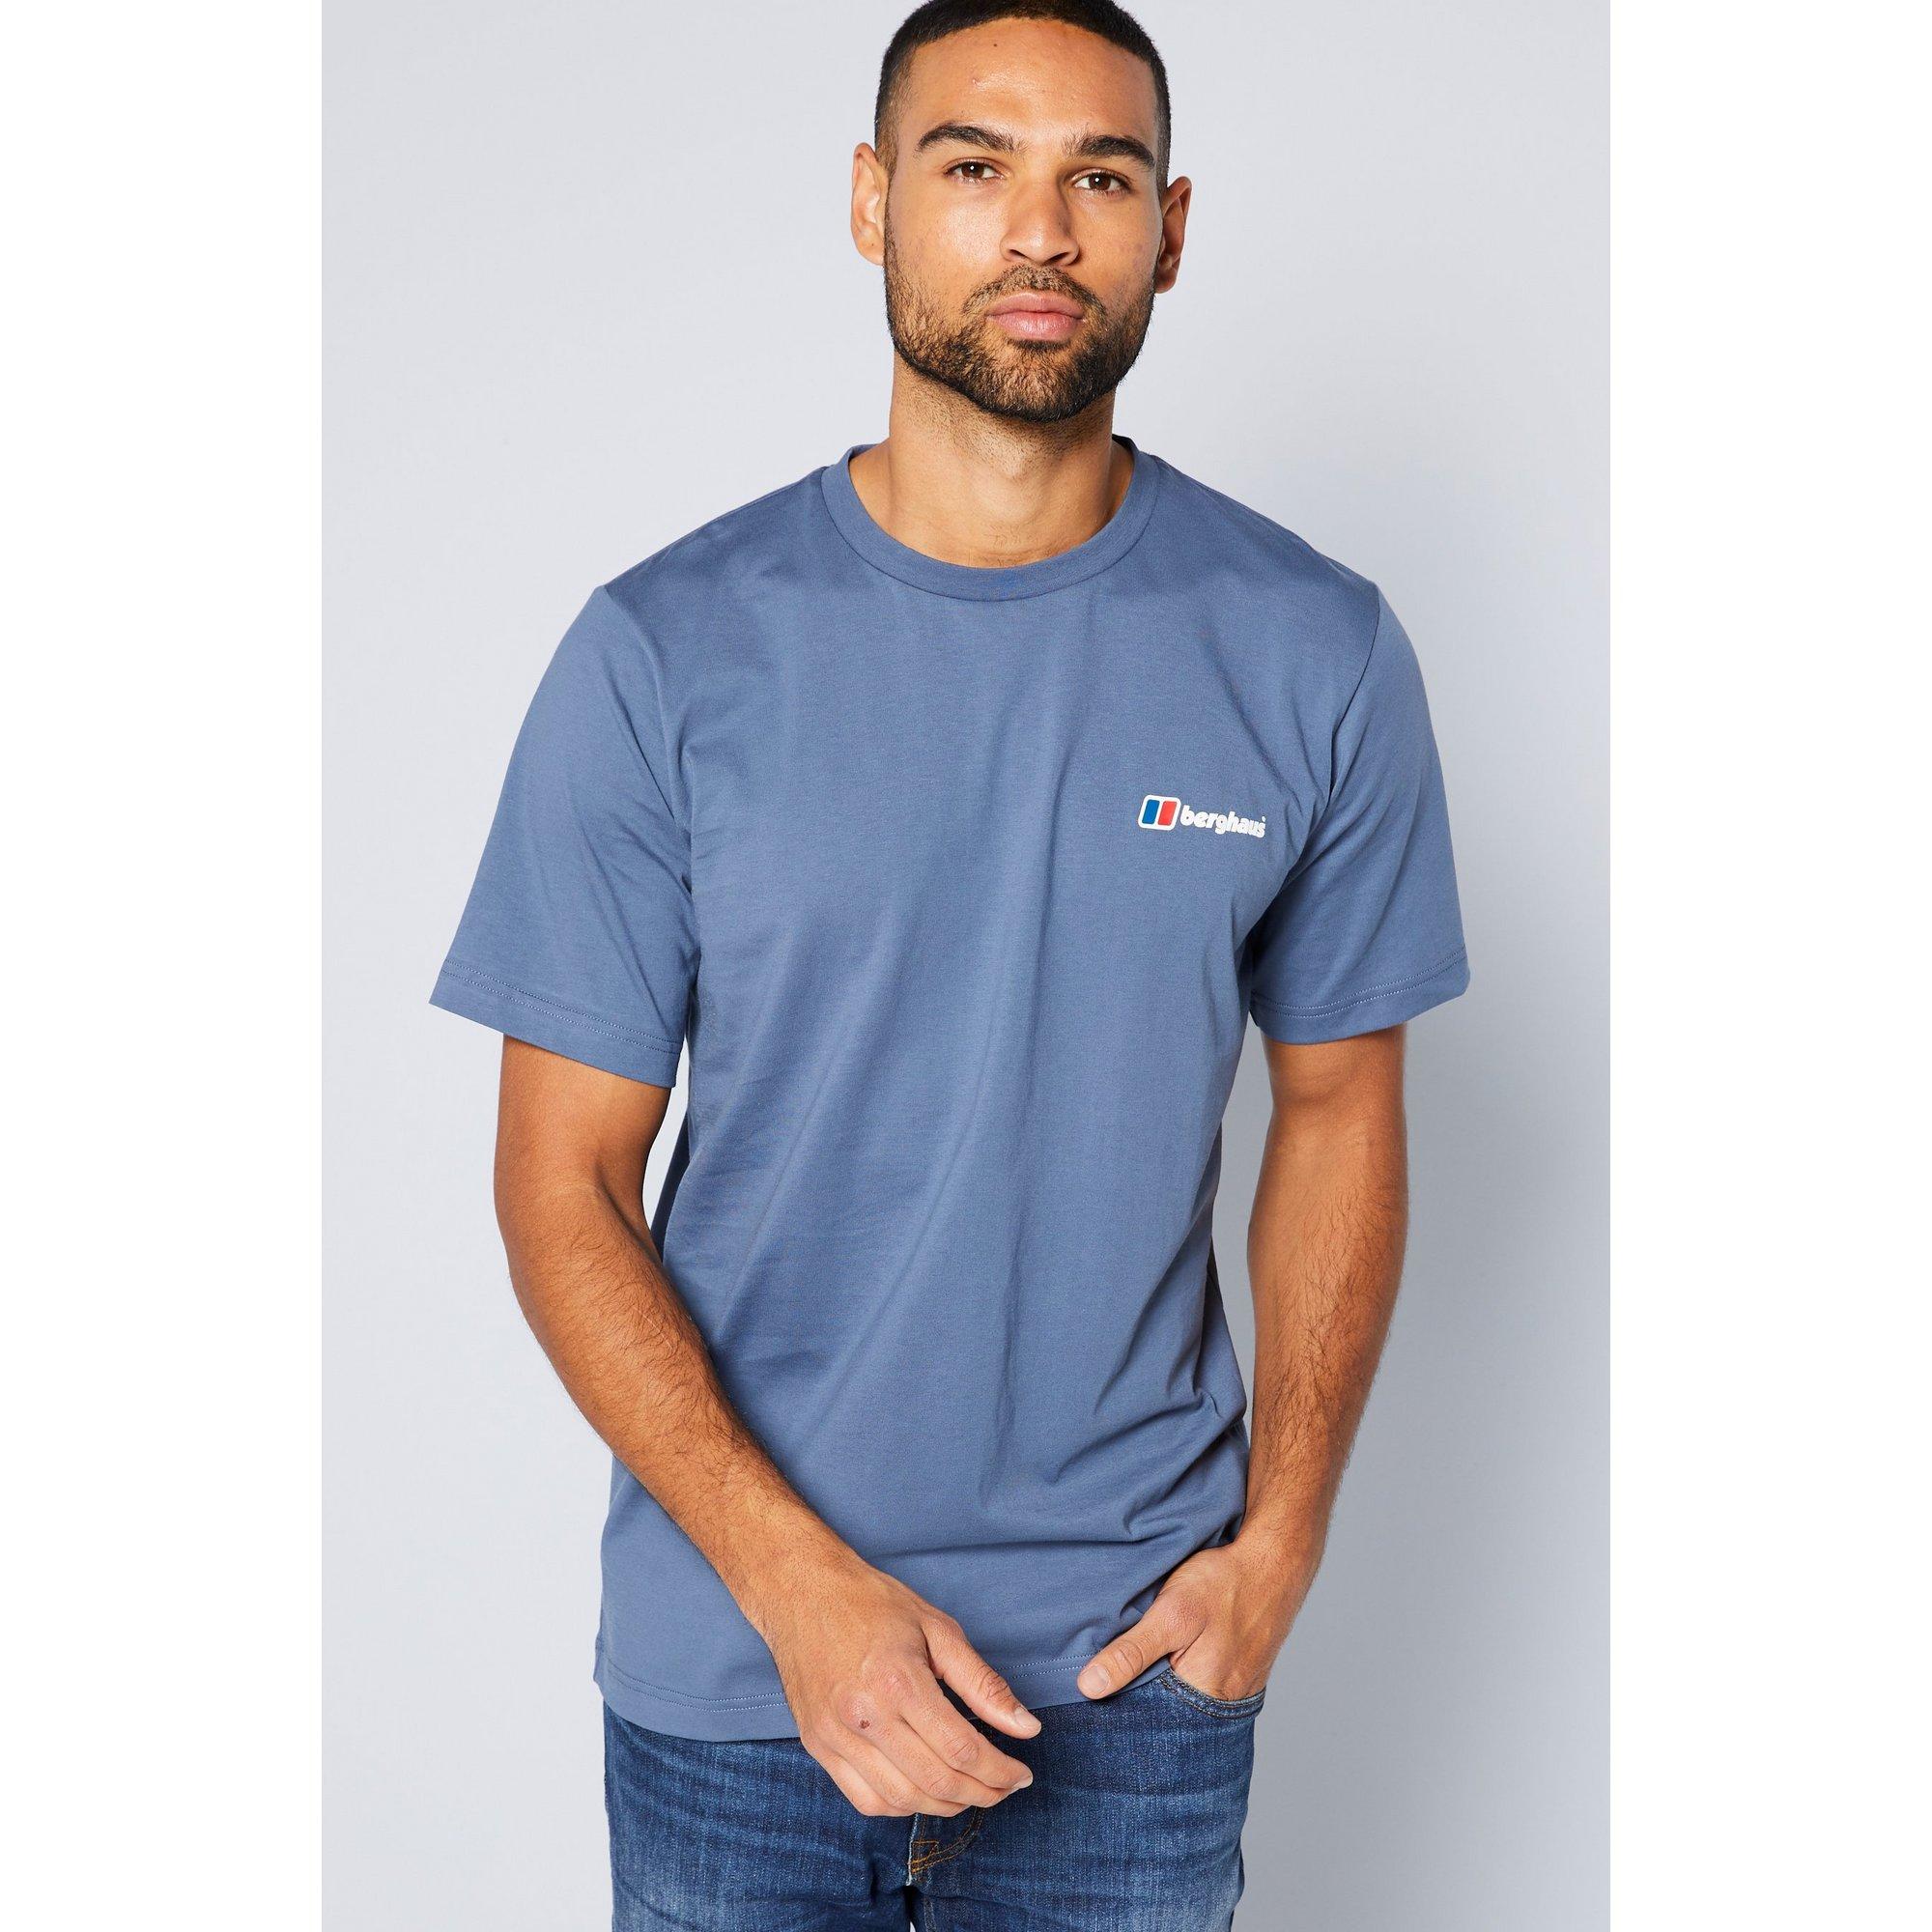 Image of Berghaus Corporate Blue T-Shirt